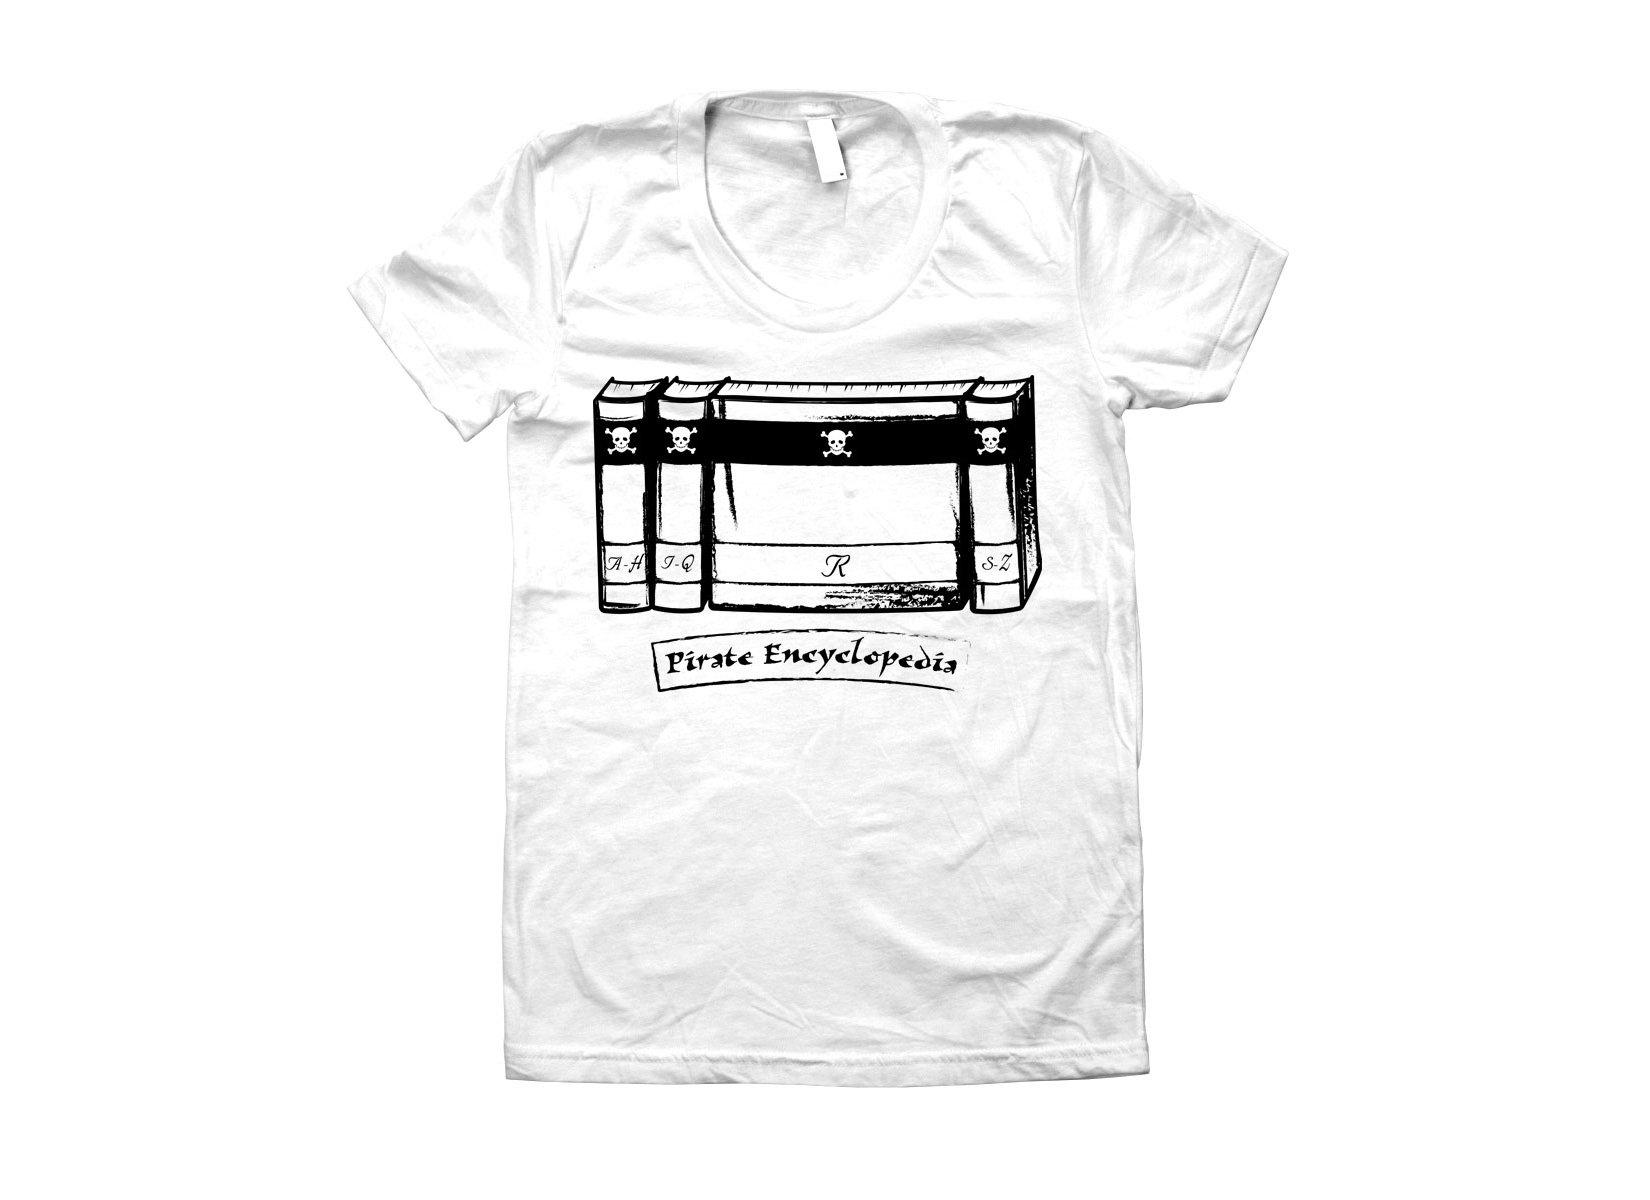 Pirate Encyclopedia on Juniors T-Shirt